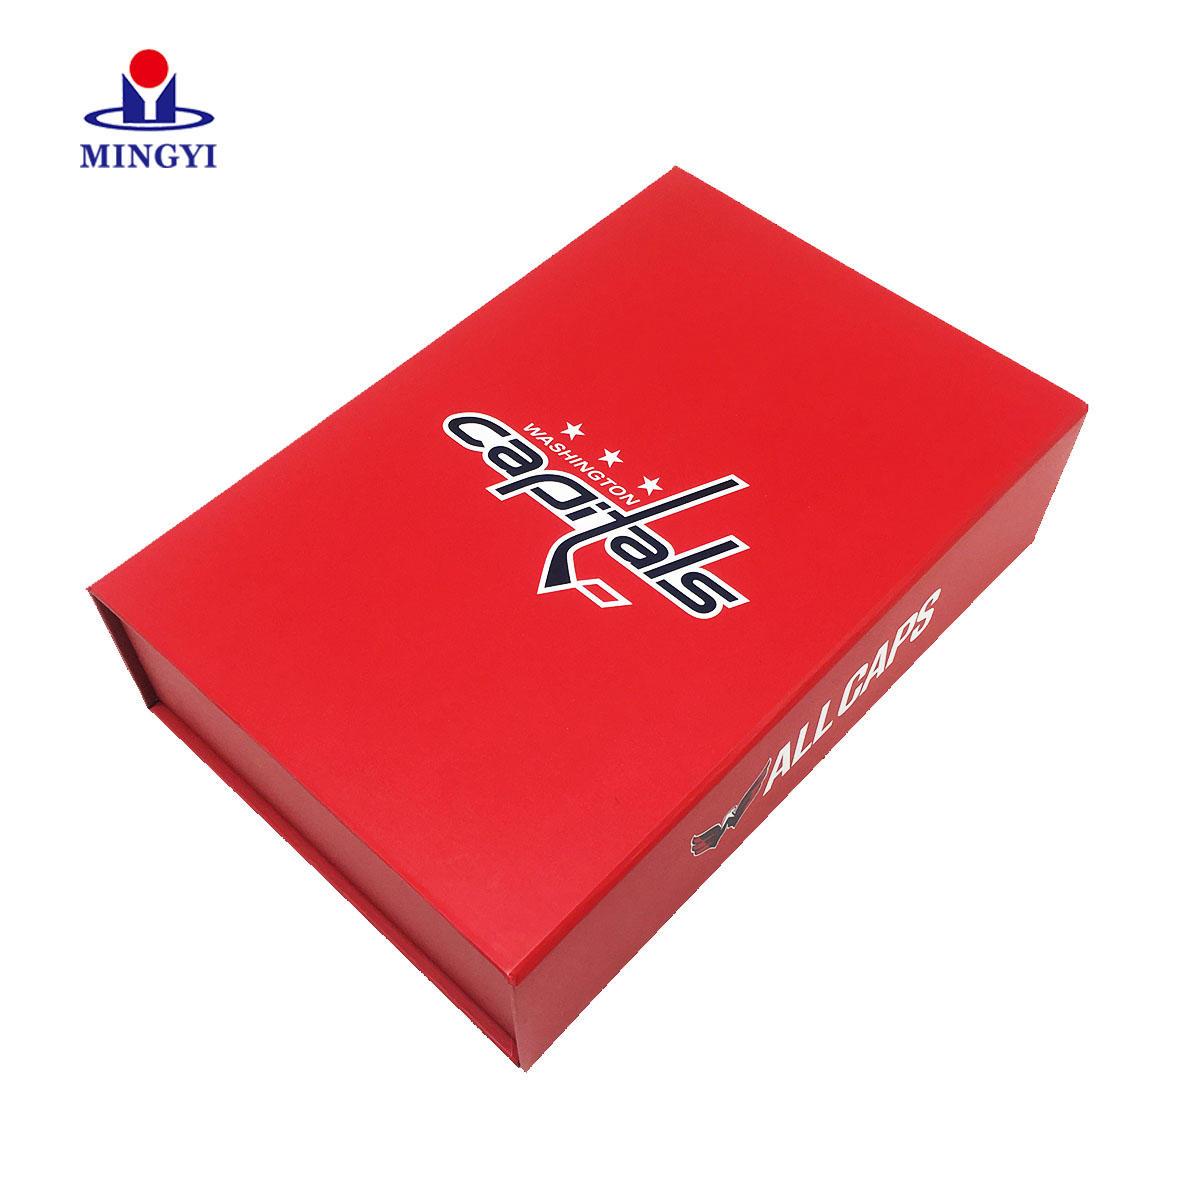 Good Price Of panini nba pandora gift box pamper set with Best Prices